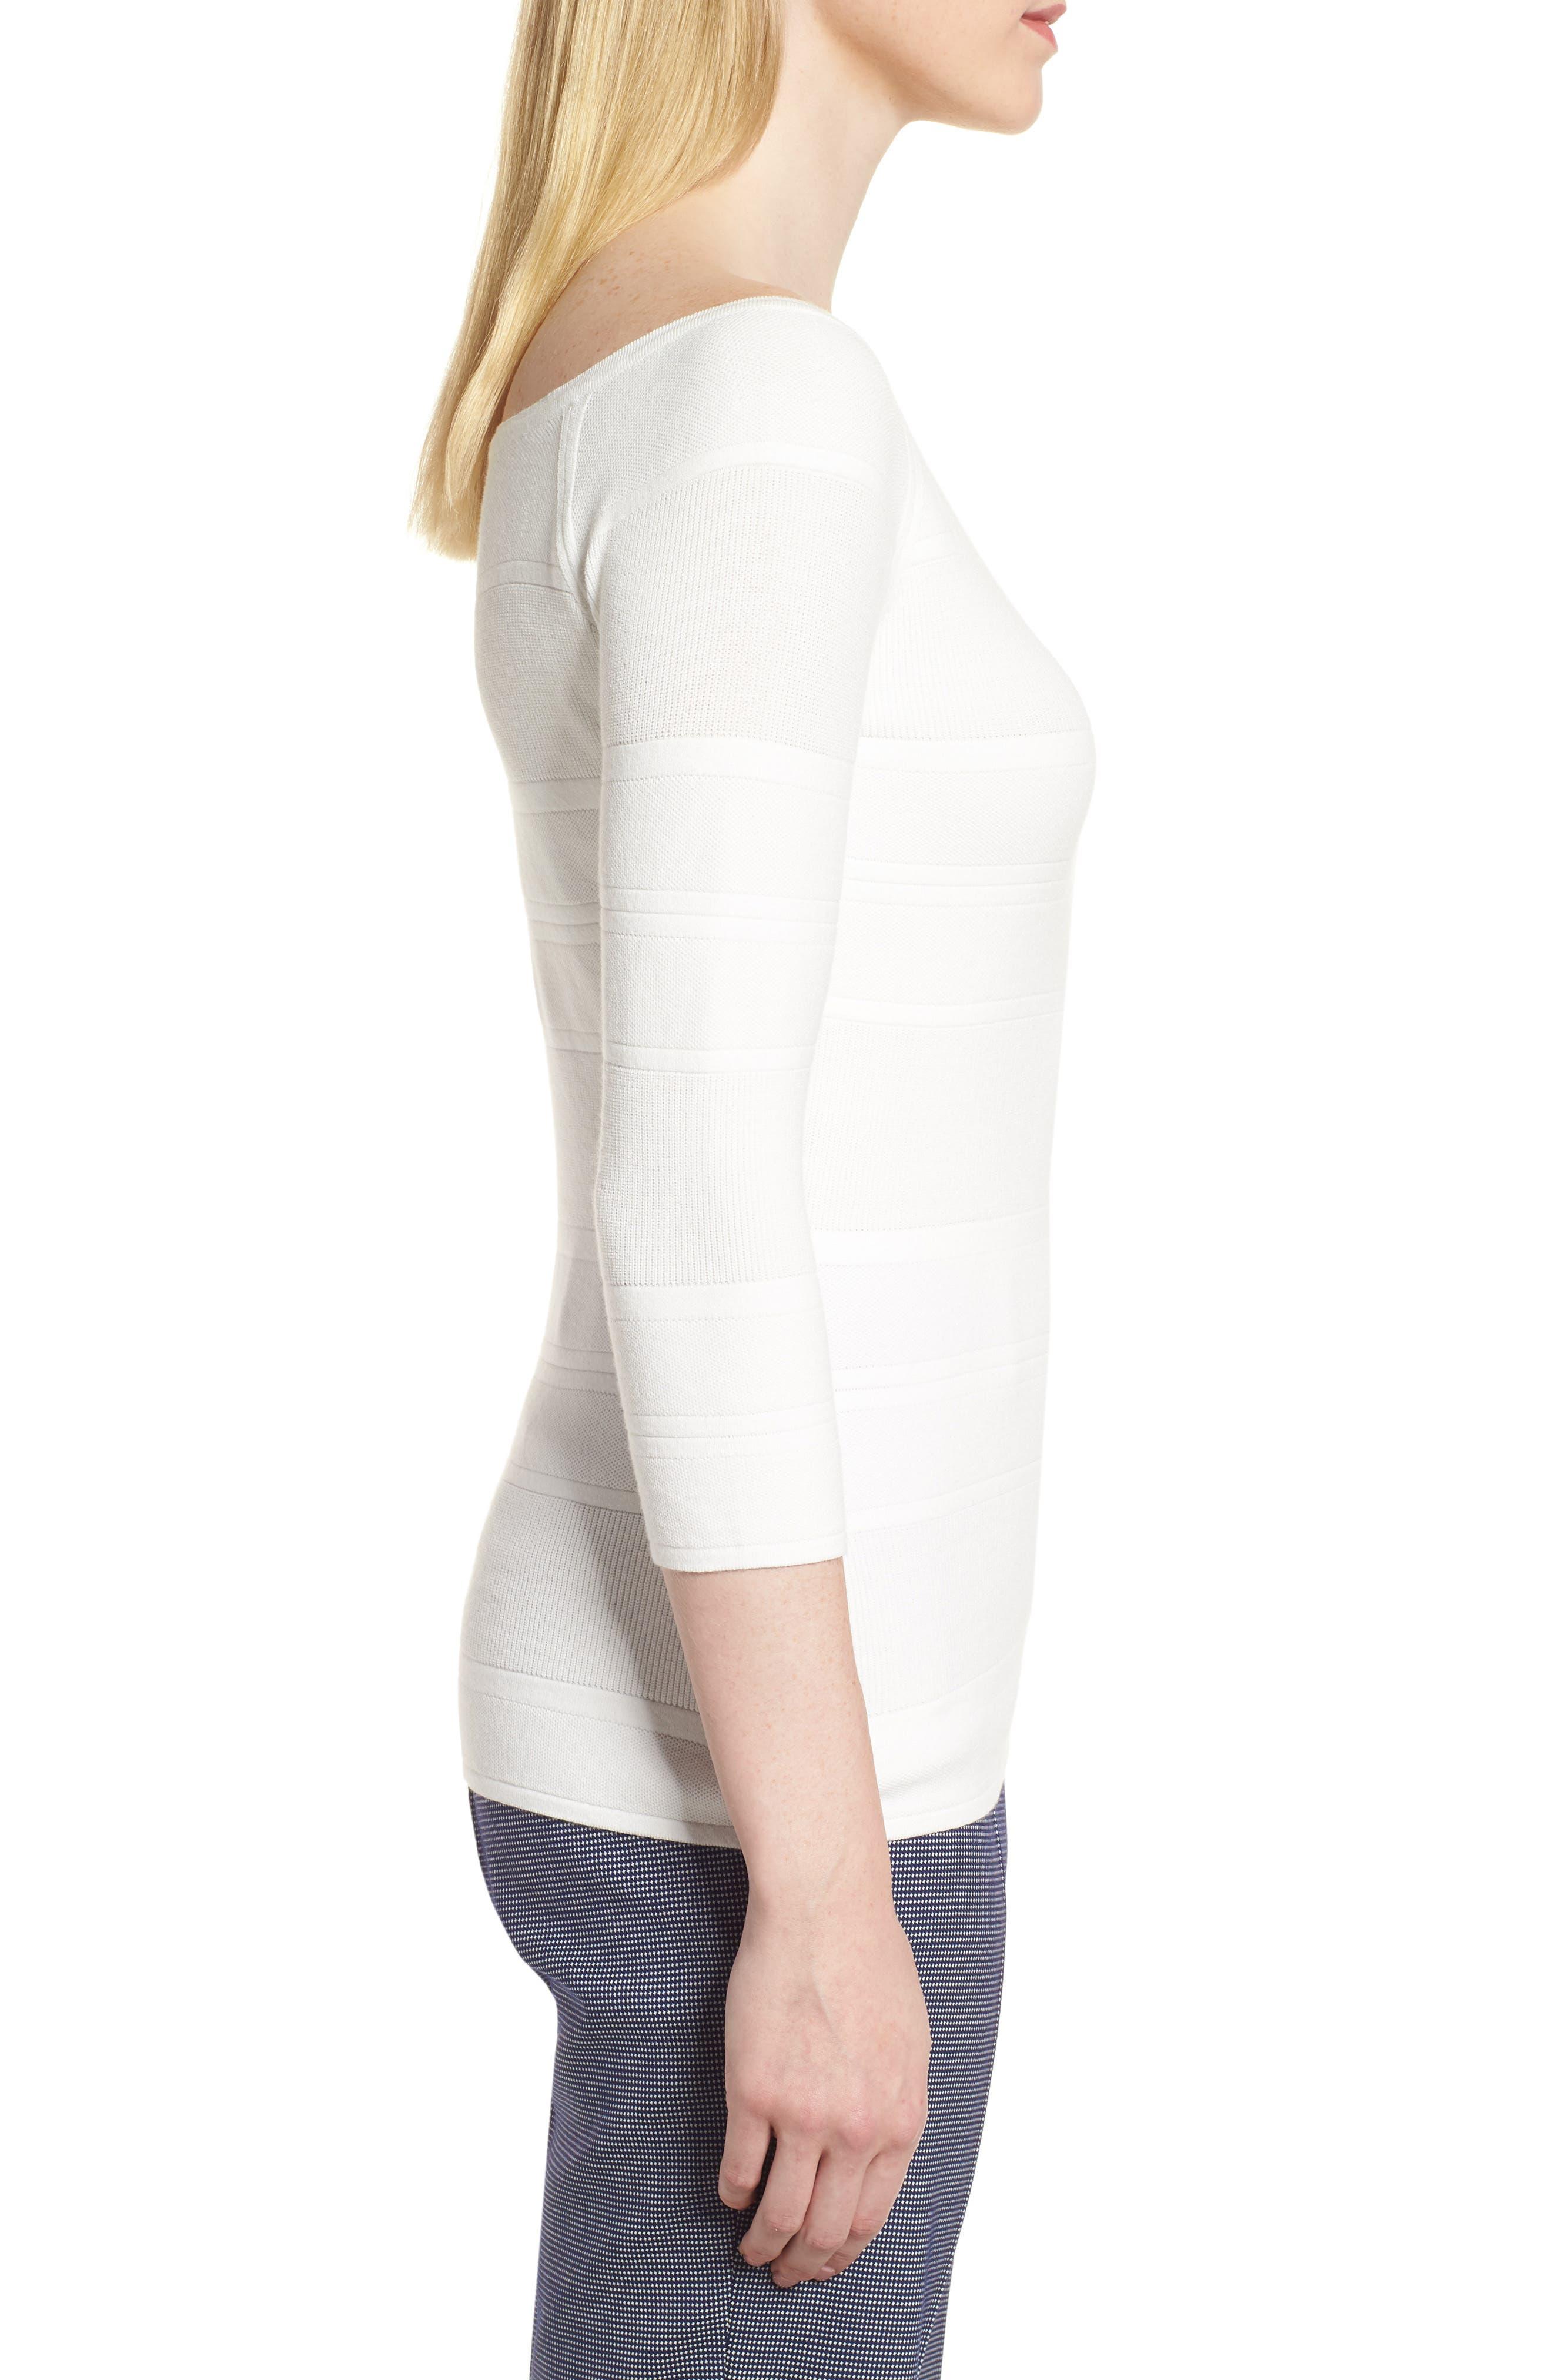 Finami Sweater,                             Alternate thumbnail 3, color,                             White